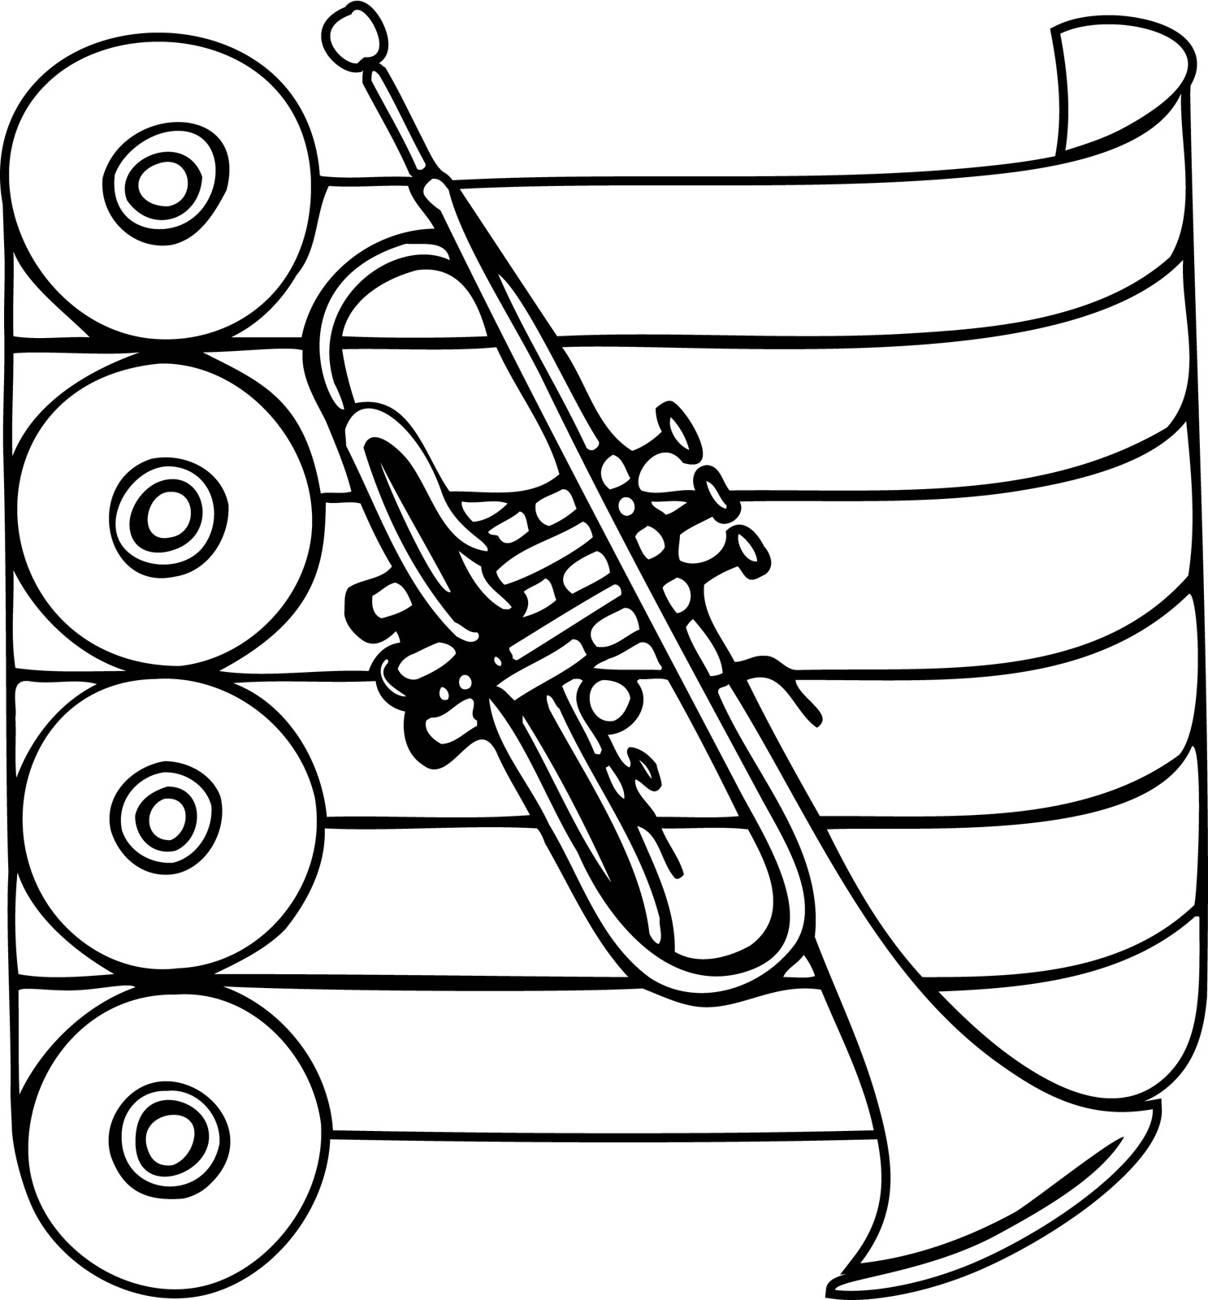 MUSIC-076